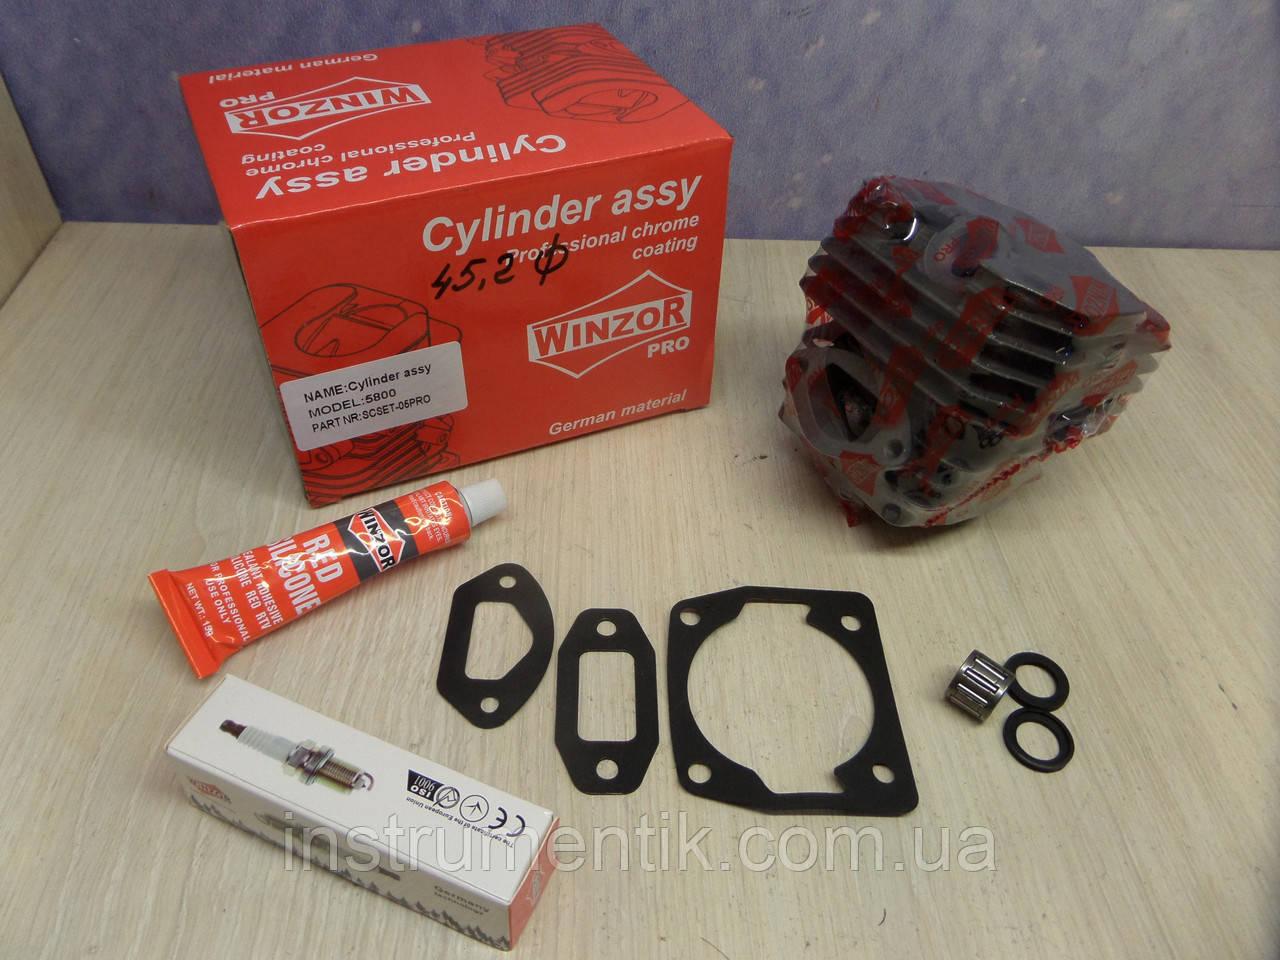 Цилиндр и поршень для бензопил 5800 Winzor + Ceramic/Grafite PRO SERIA